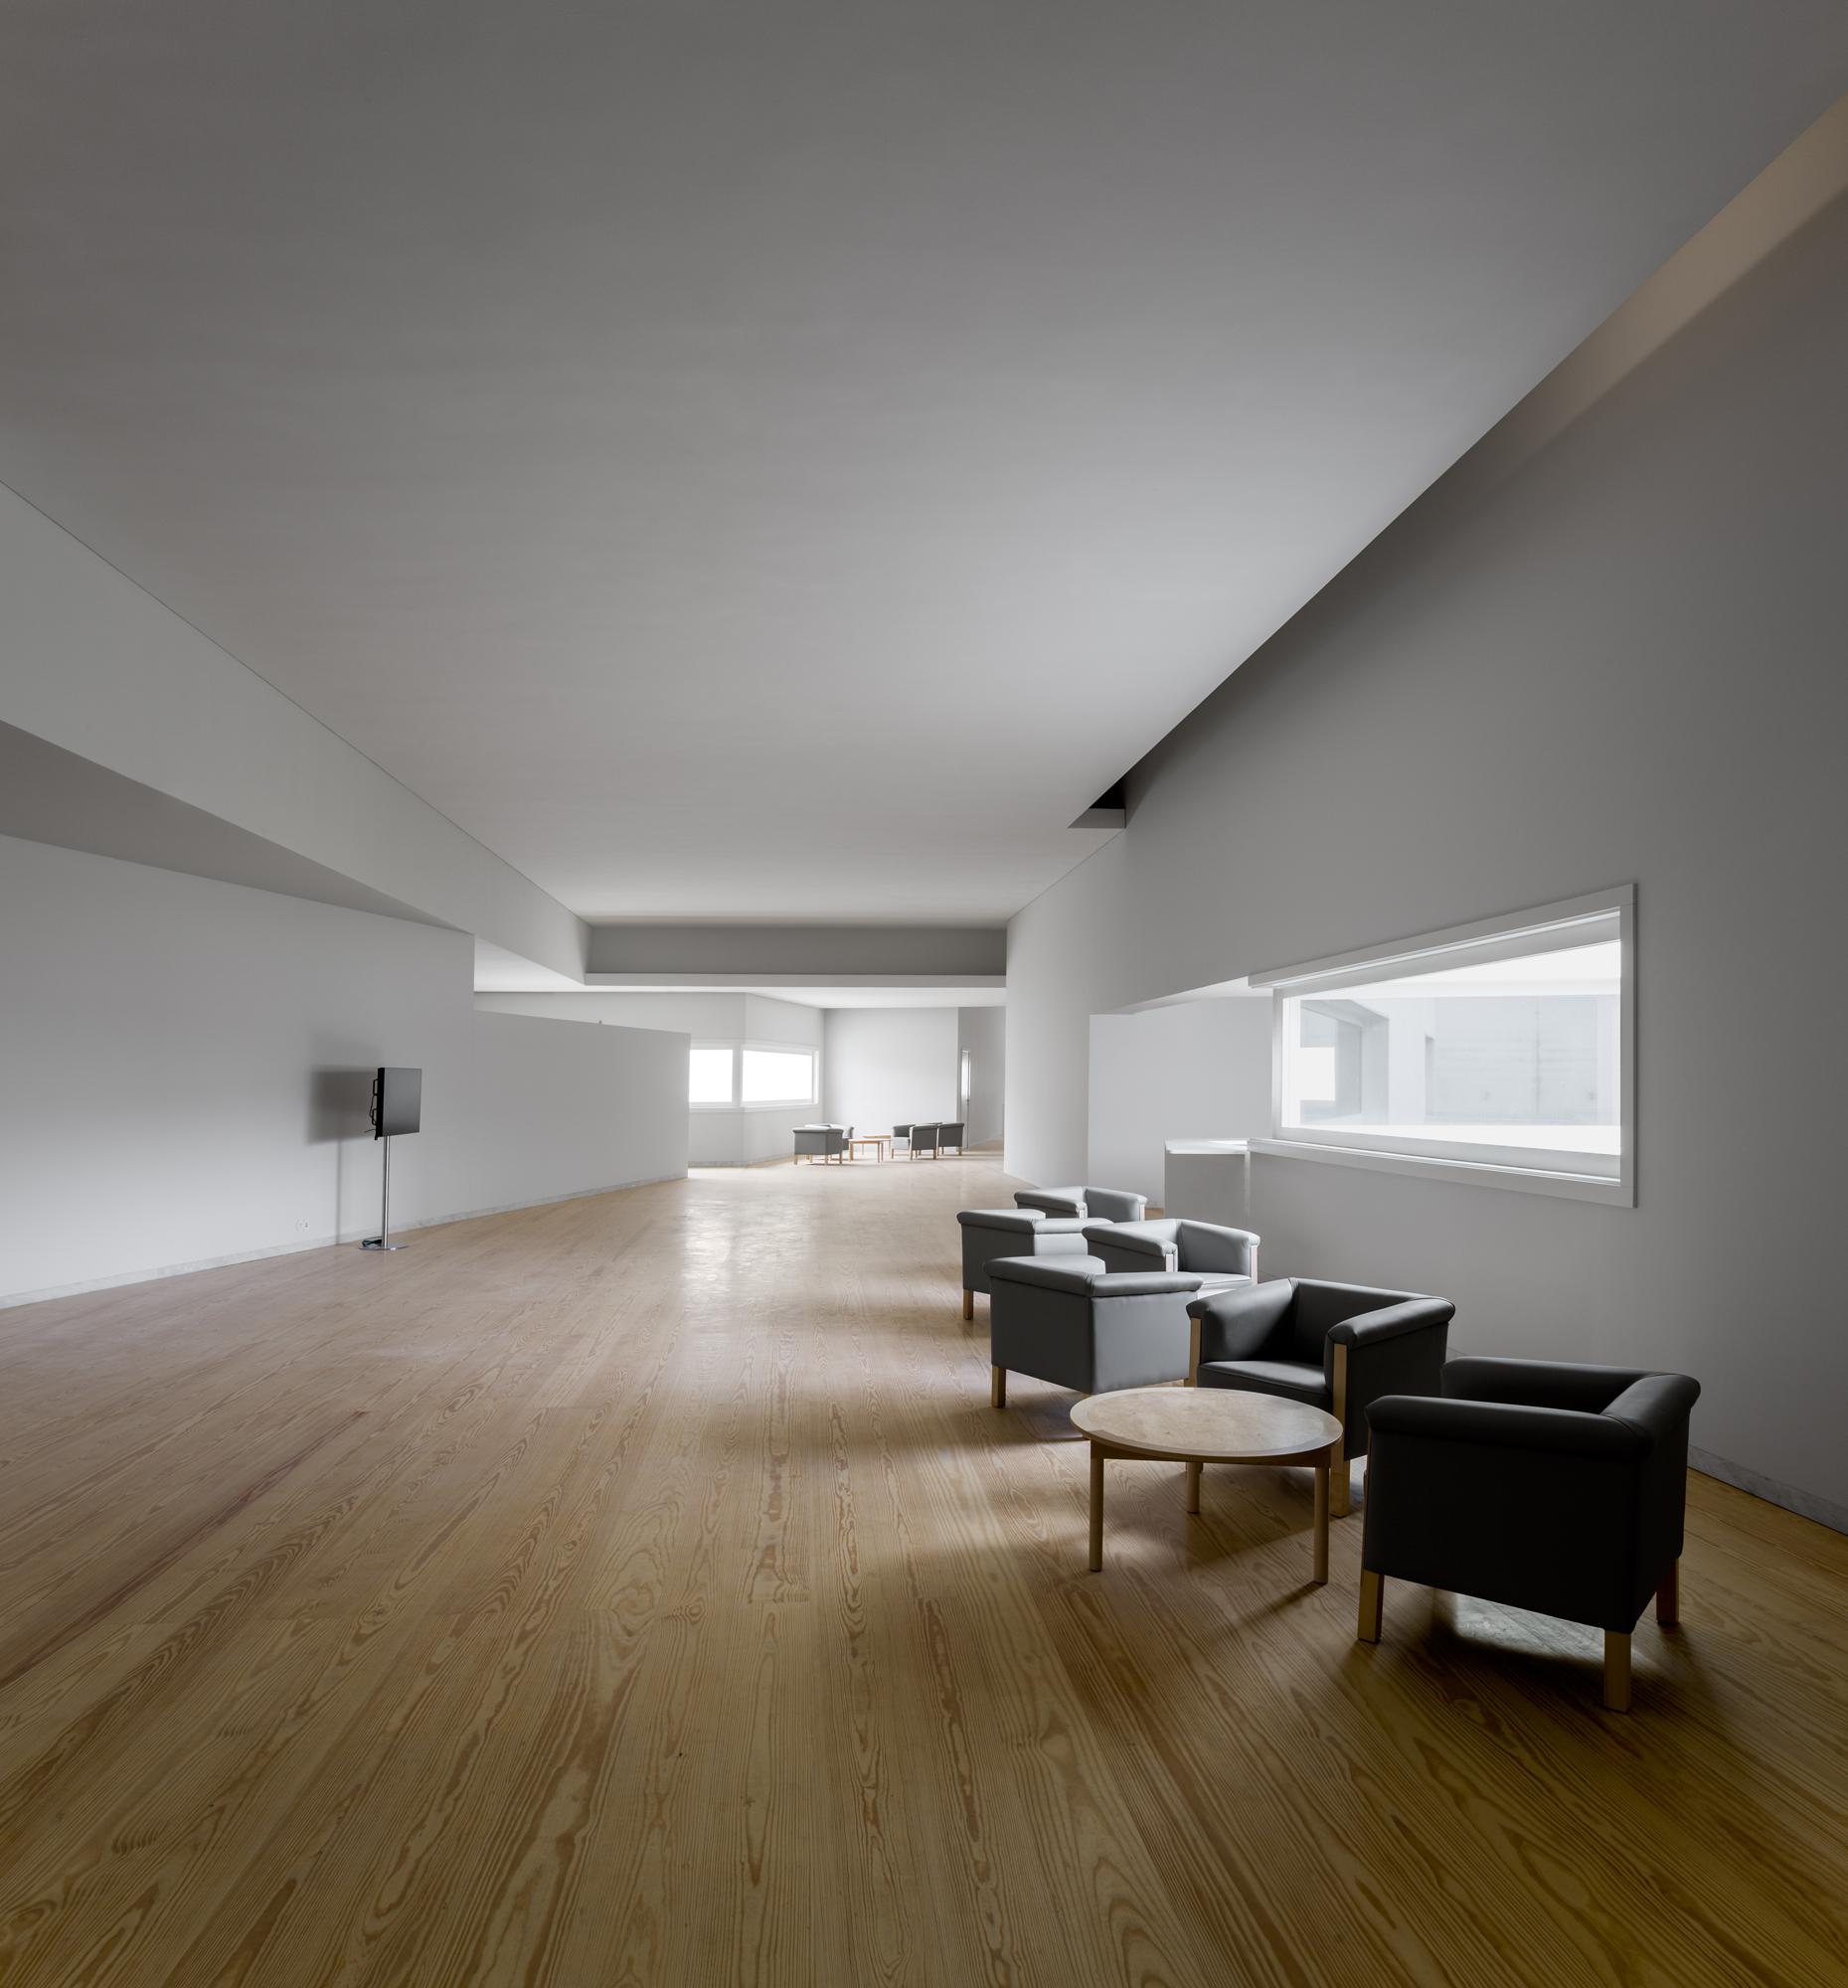 Gallery Of Nadir Afonso Contemporary Art Museum 193 Lvaro Siza Vieira 24